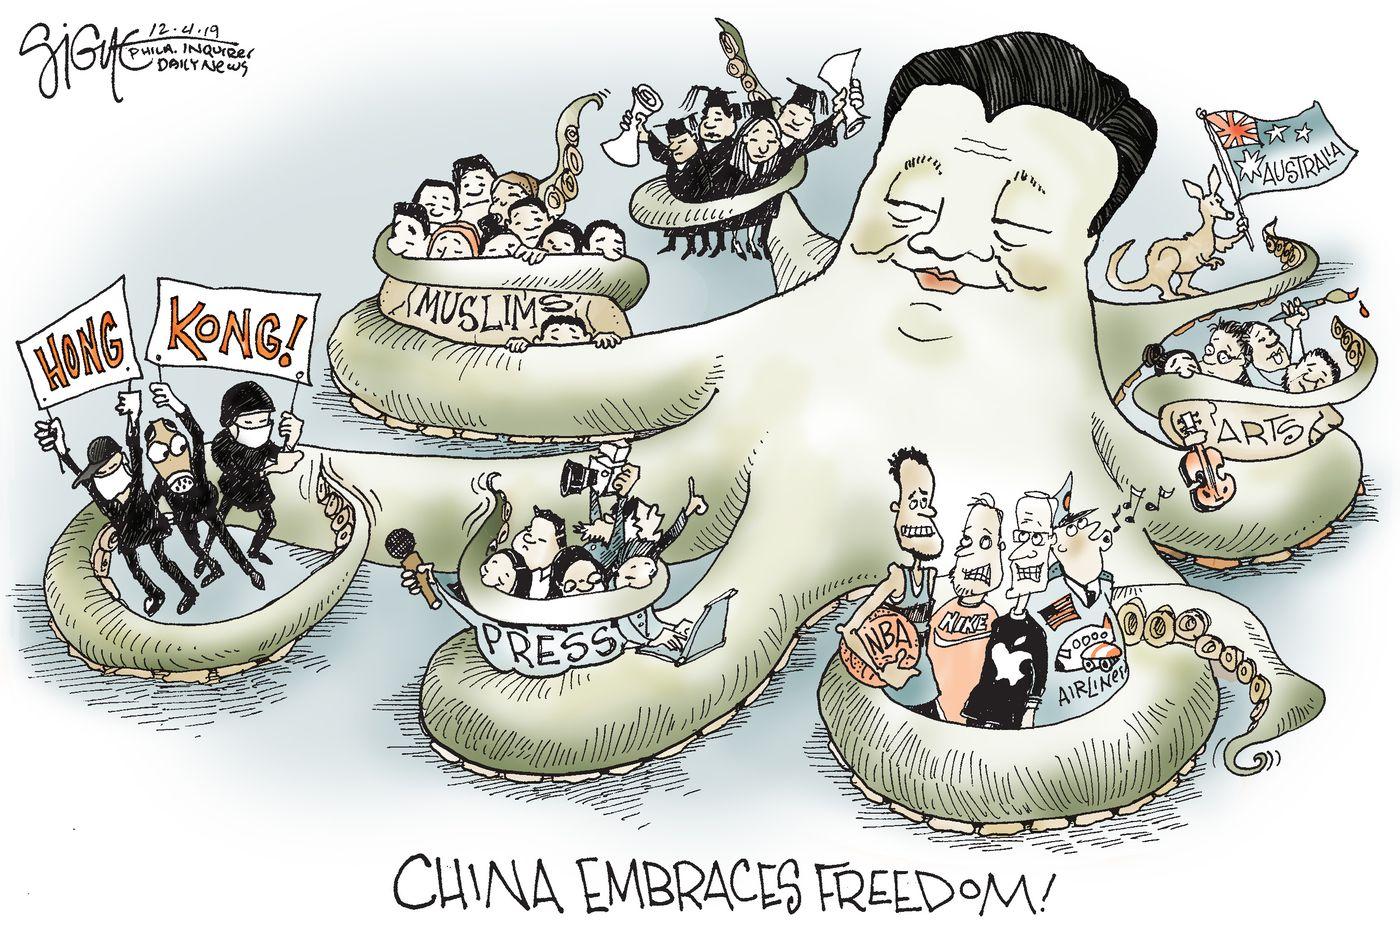 Political Cartoon: China embraces freedom